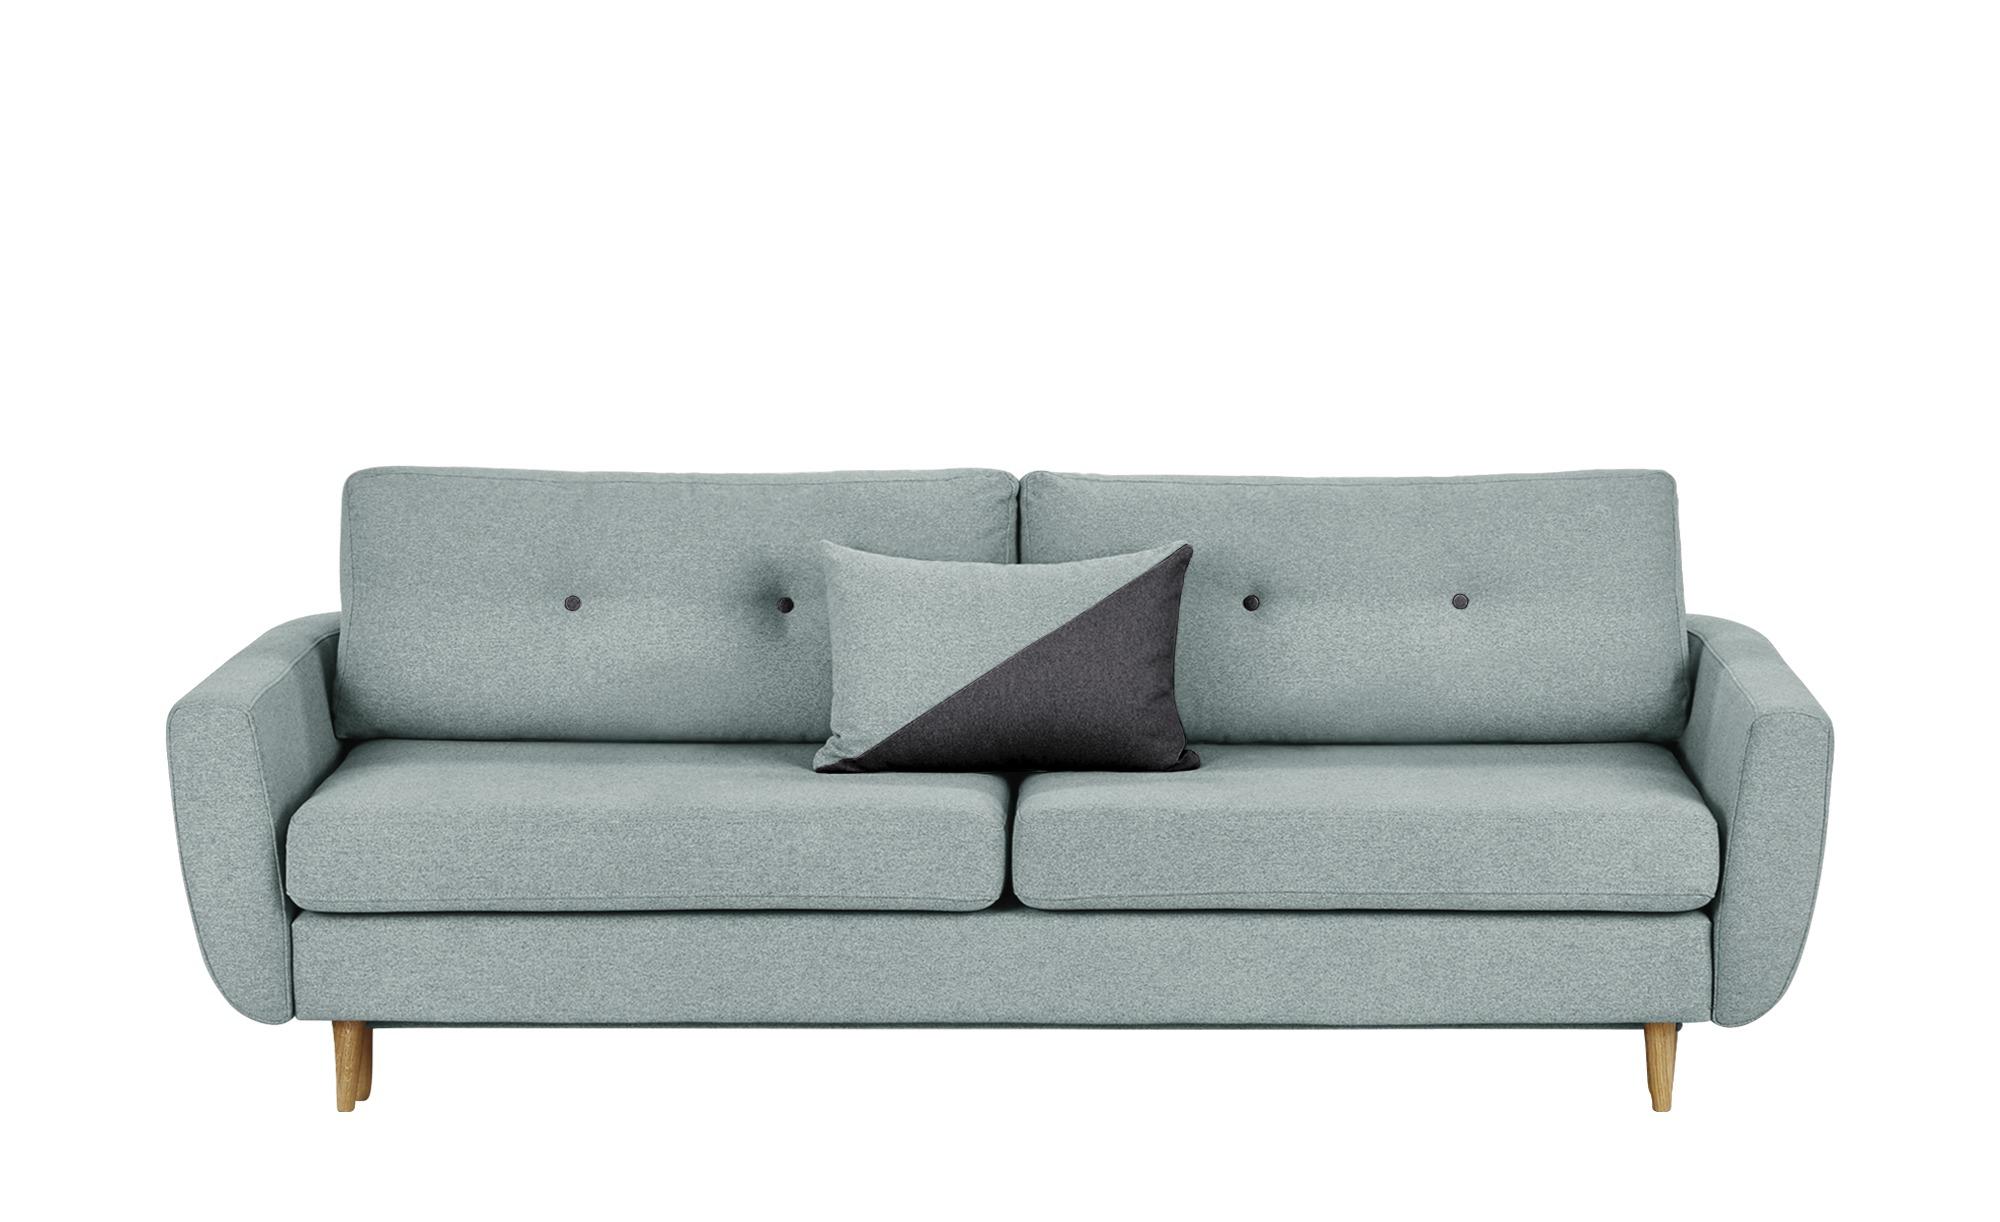 finya Schlafsofa, 3-sitzig mintgrün - Webstoff Harris ¦ Maße (cm): B: 231 H: 85 T: 92 Polstermöbel > Sofas > 3-Sitzer - Höffner